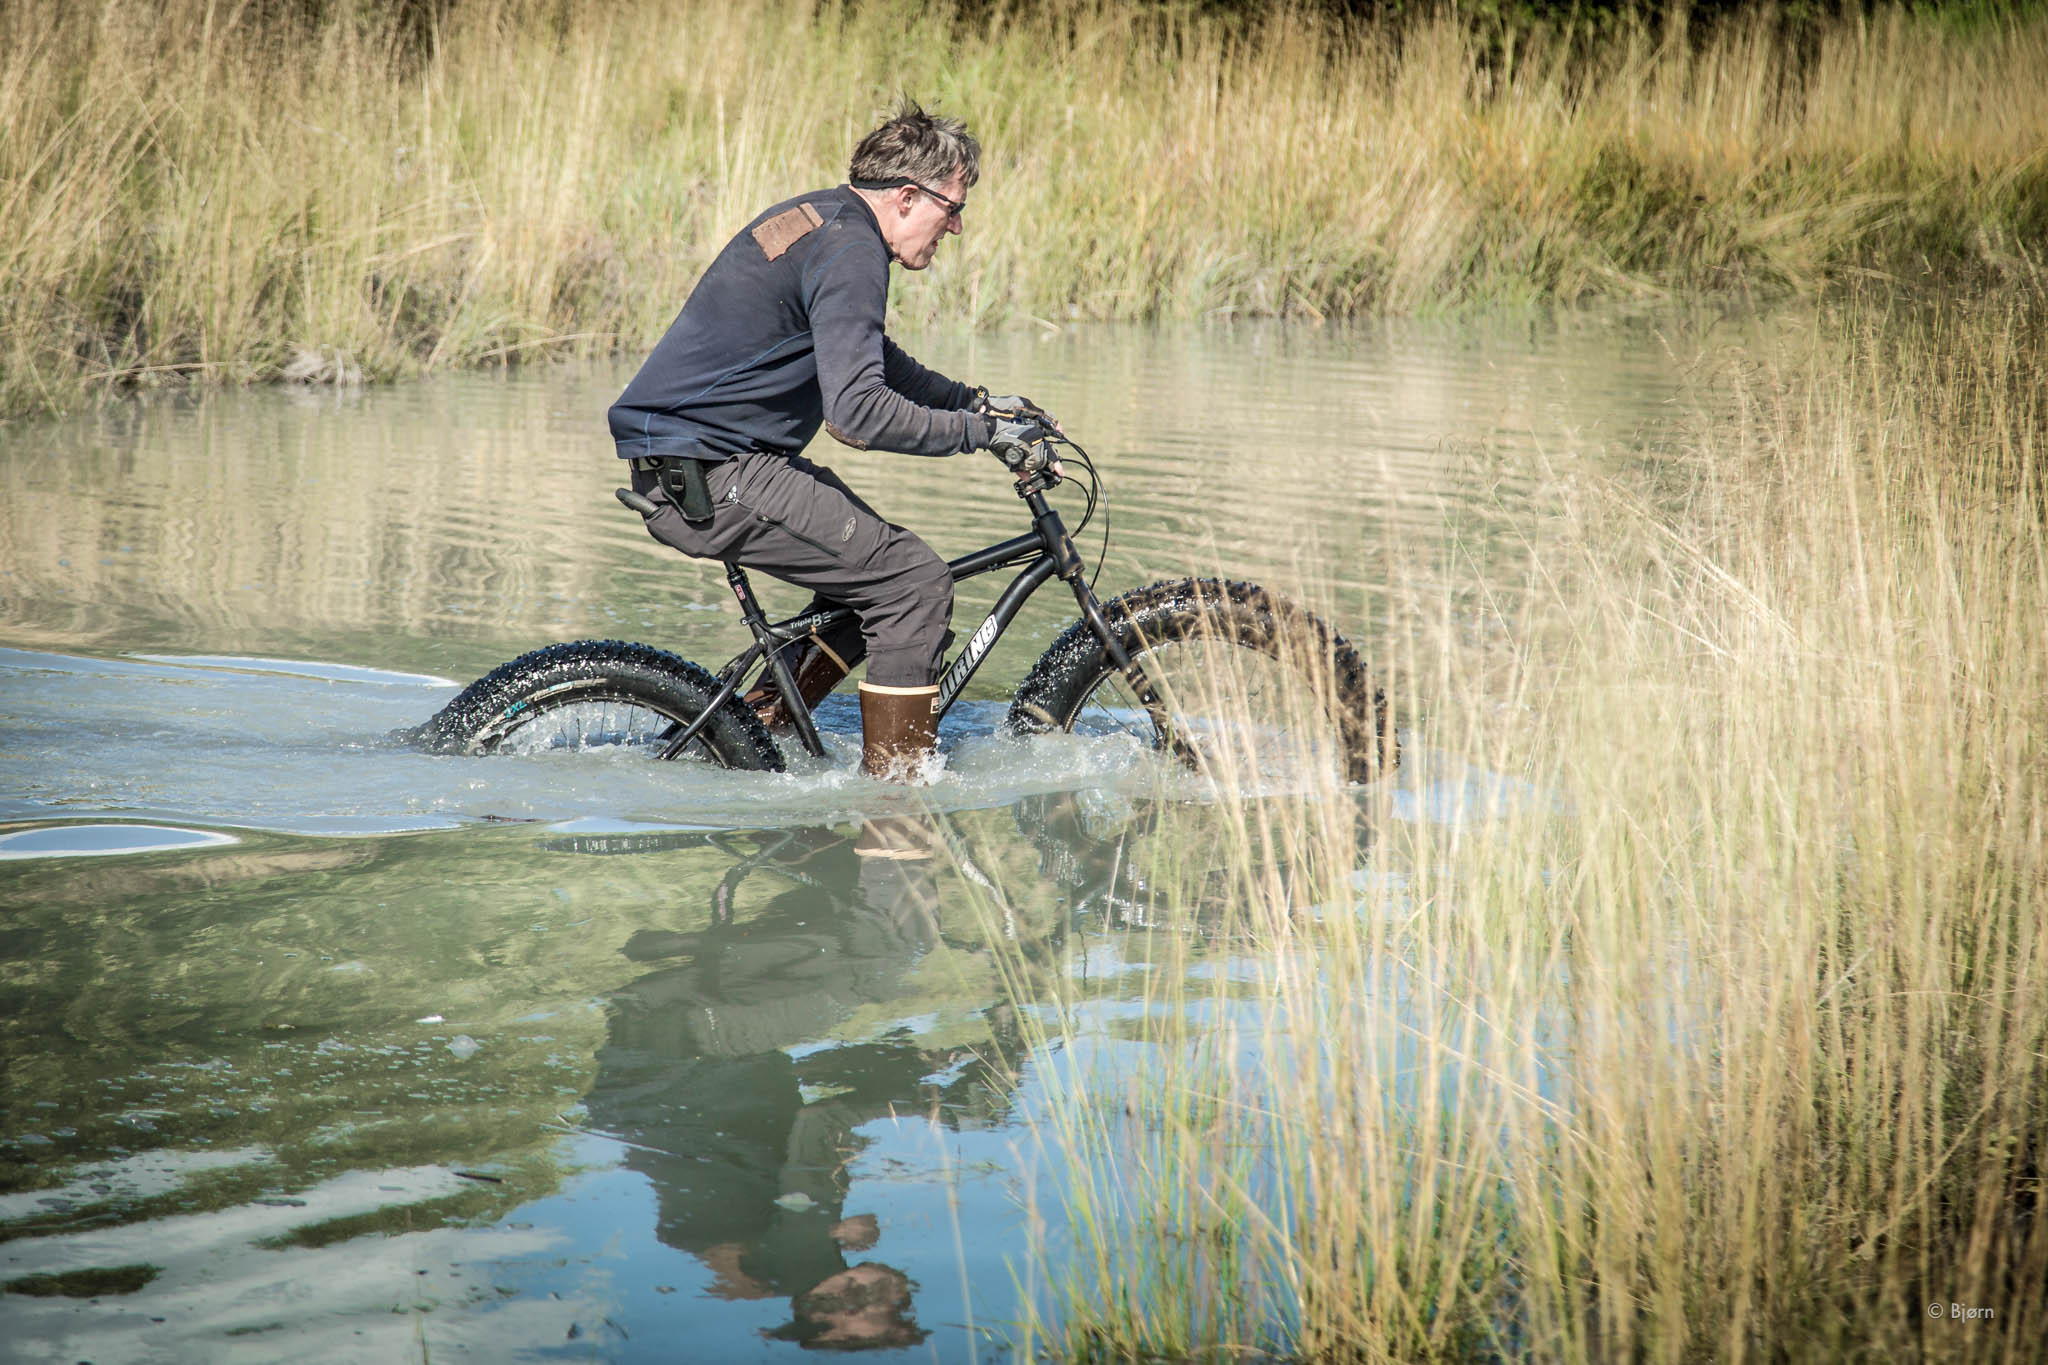 George rides through a deep creek - Seward, Alaska.